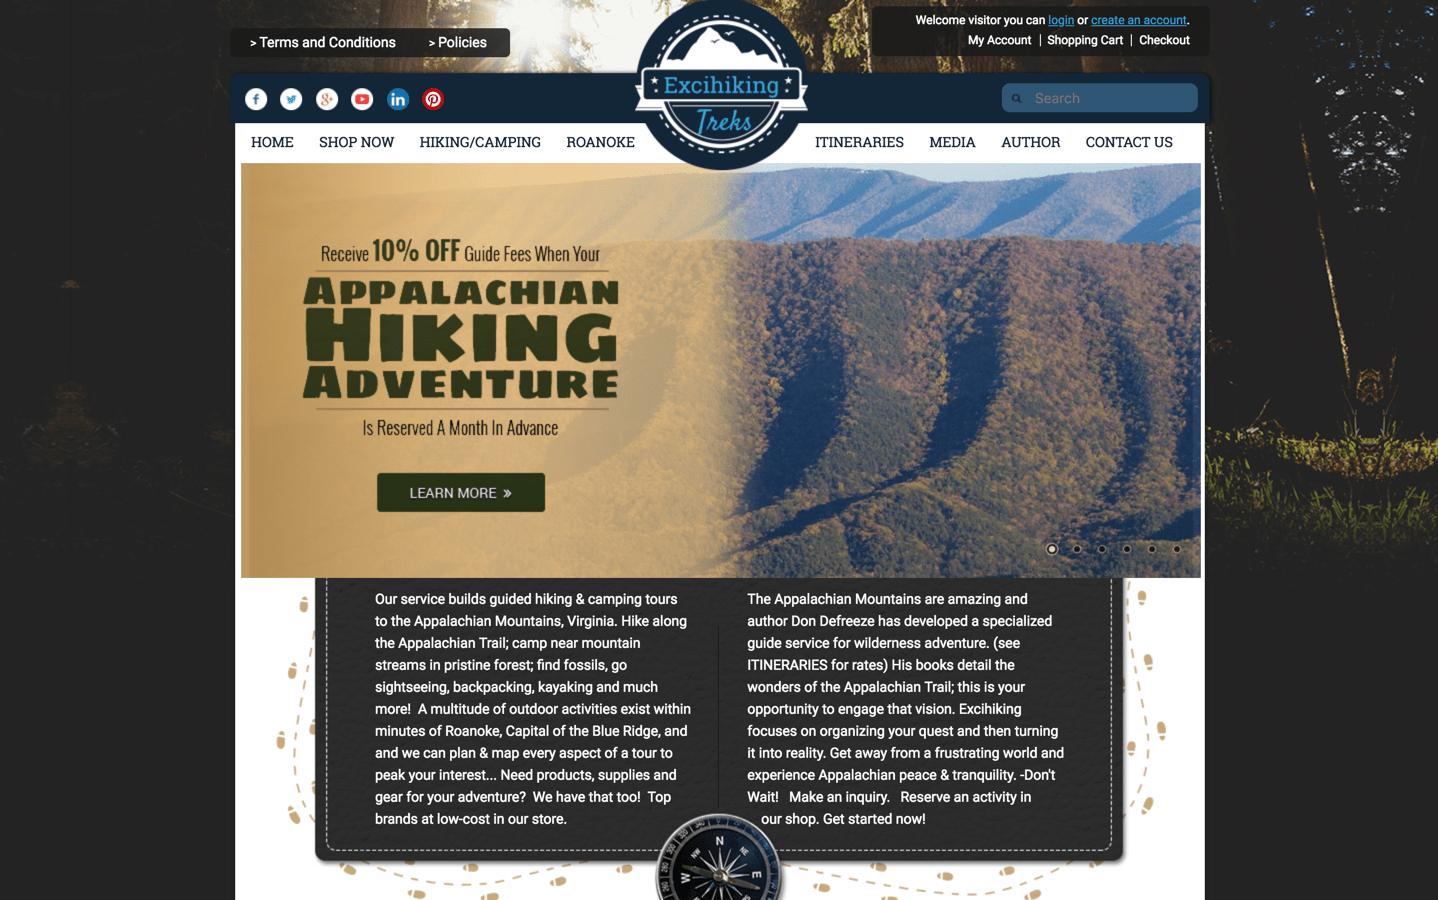 excihiking website